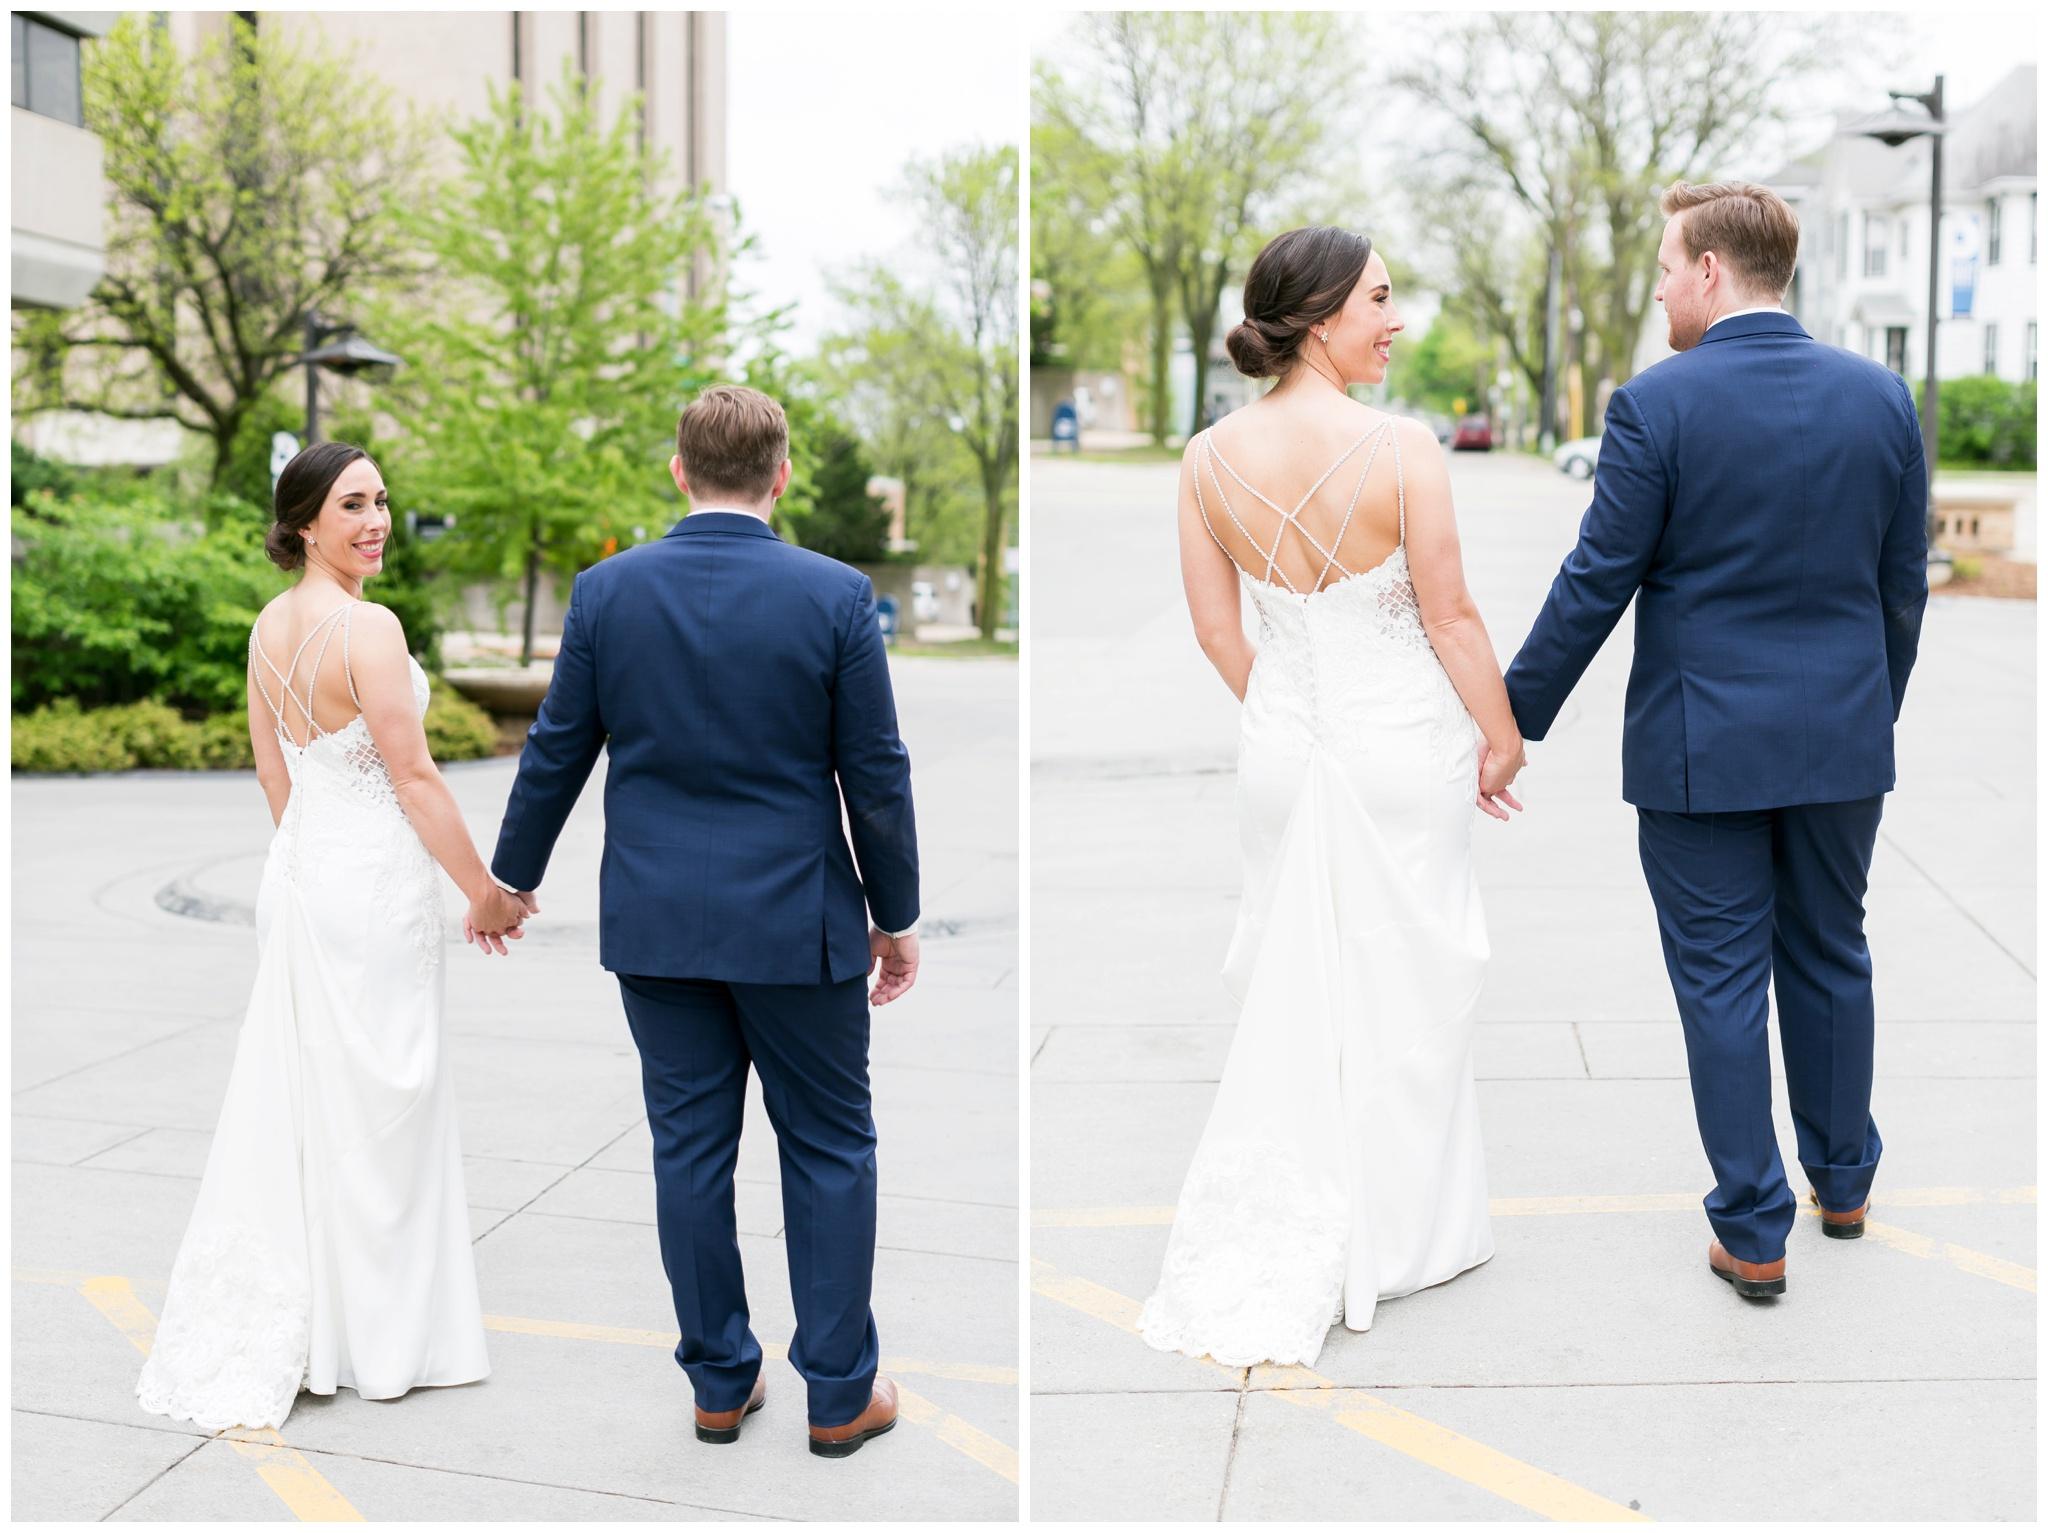 Union_south_Wedding_Madison_Wisconsin_Caynay_Photo_3684.jpg